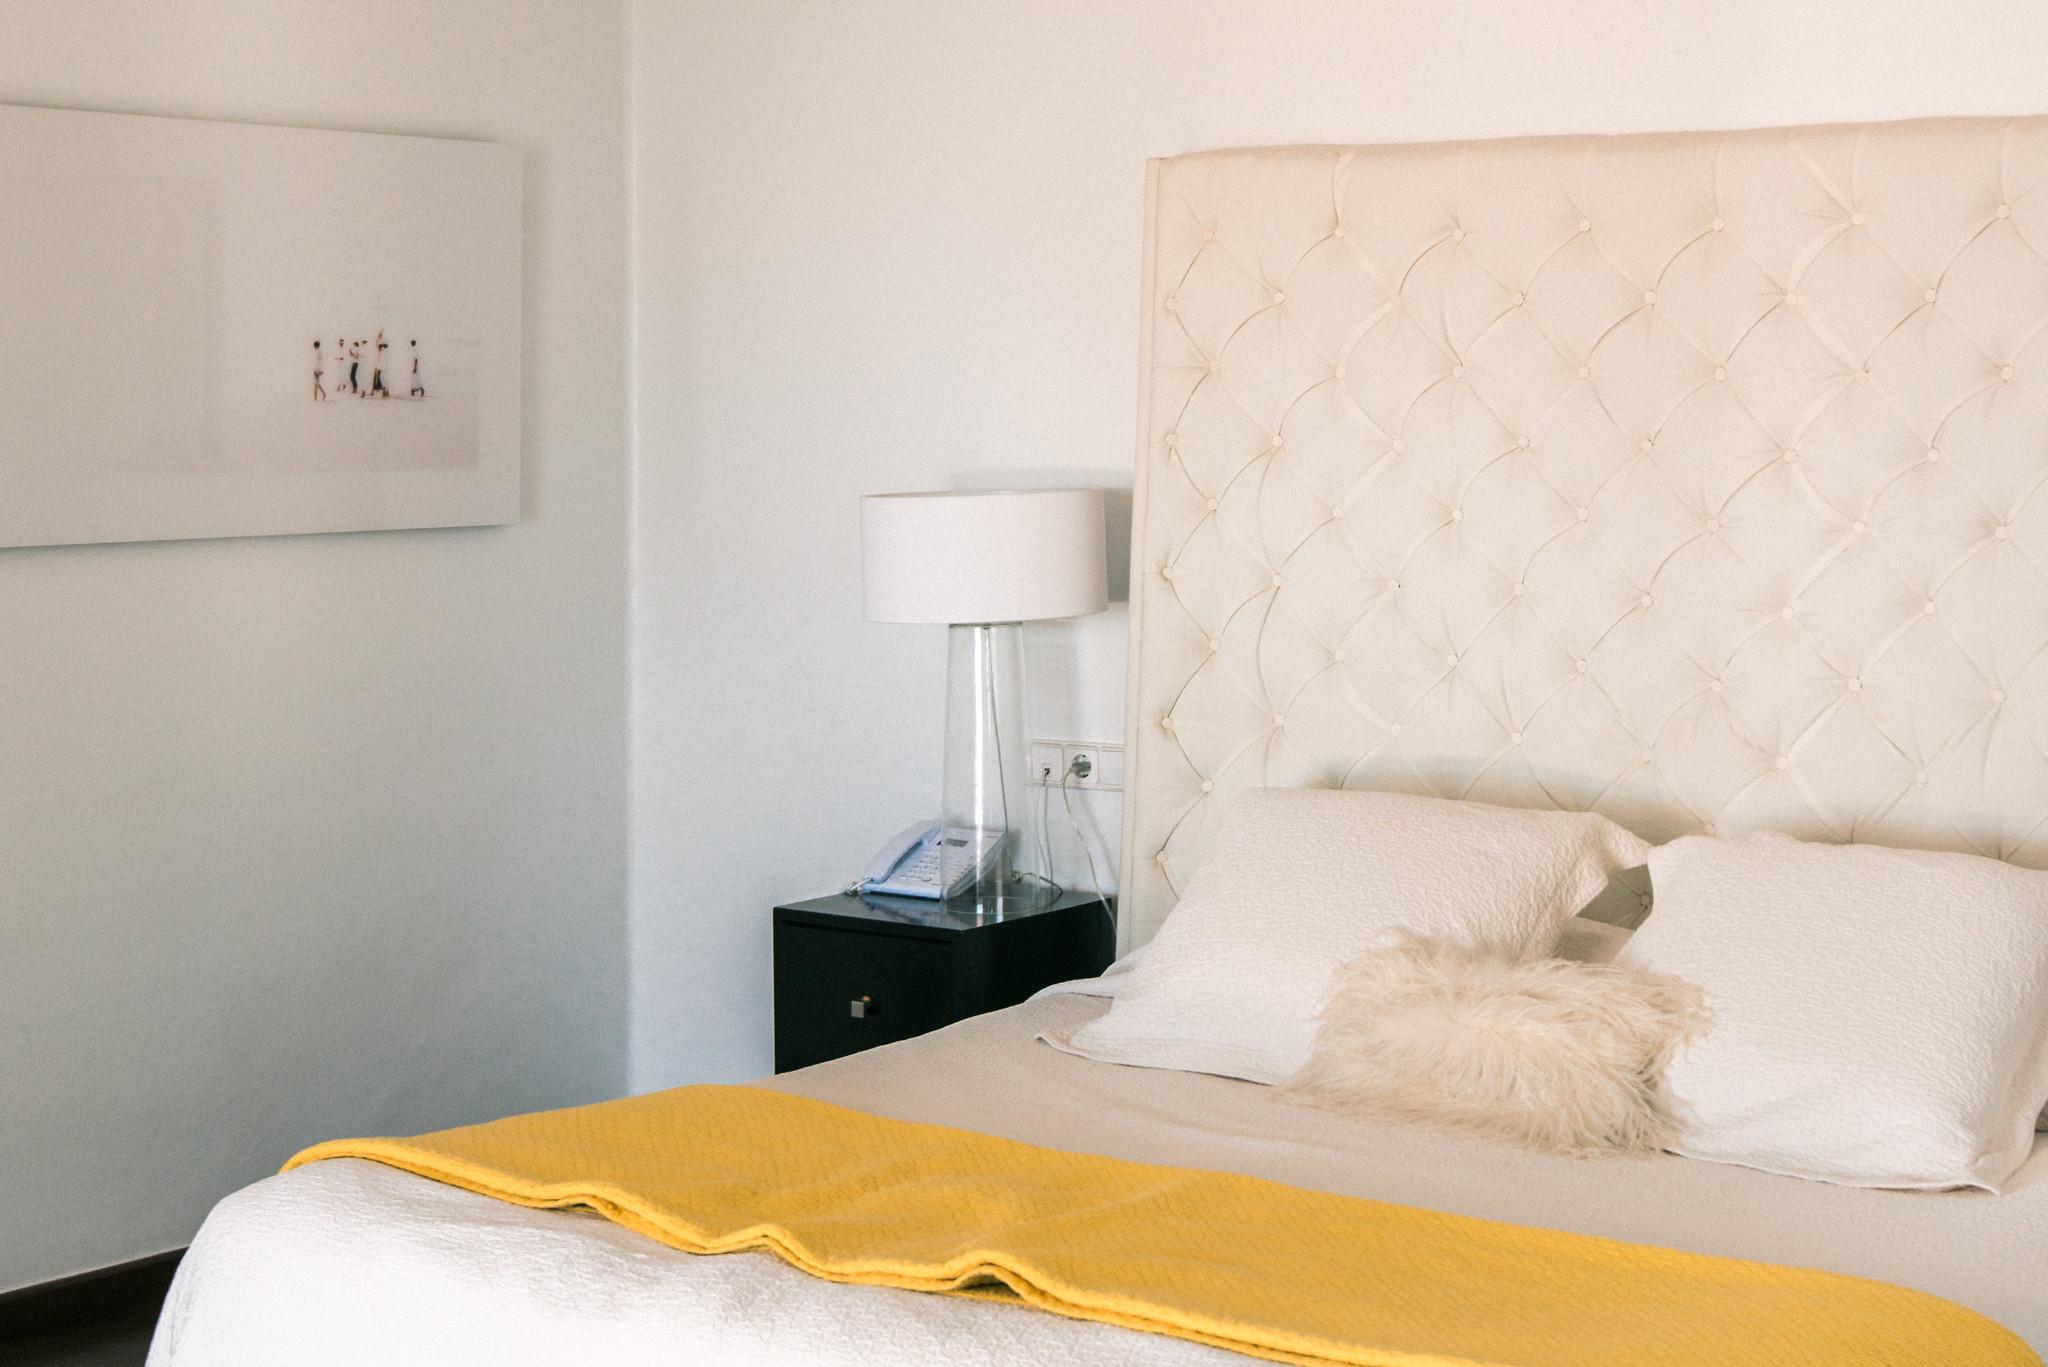 https://www.white-ibiza.com/wp-content/uploads/2020/06/white-ibiza-villas-casa-odette-interior-bedroom8.jpg